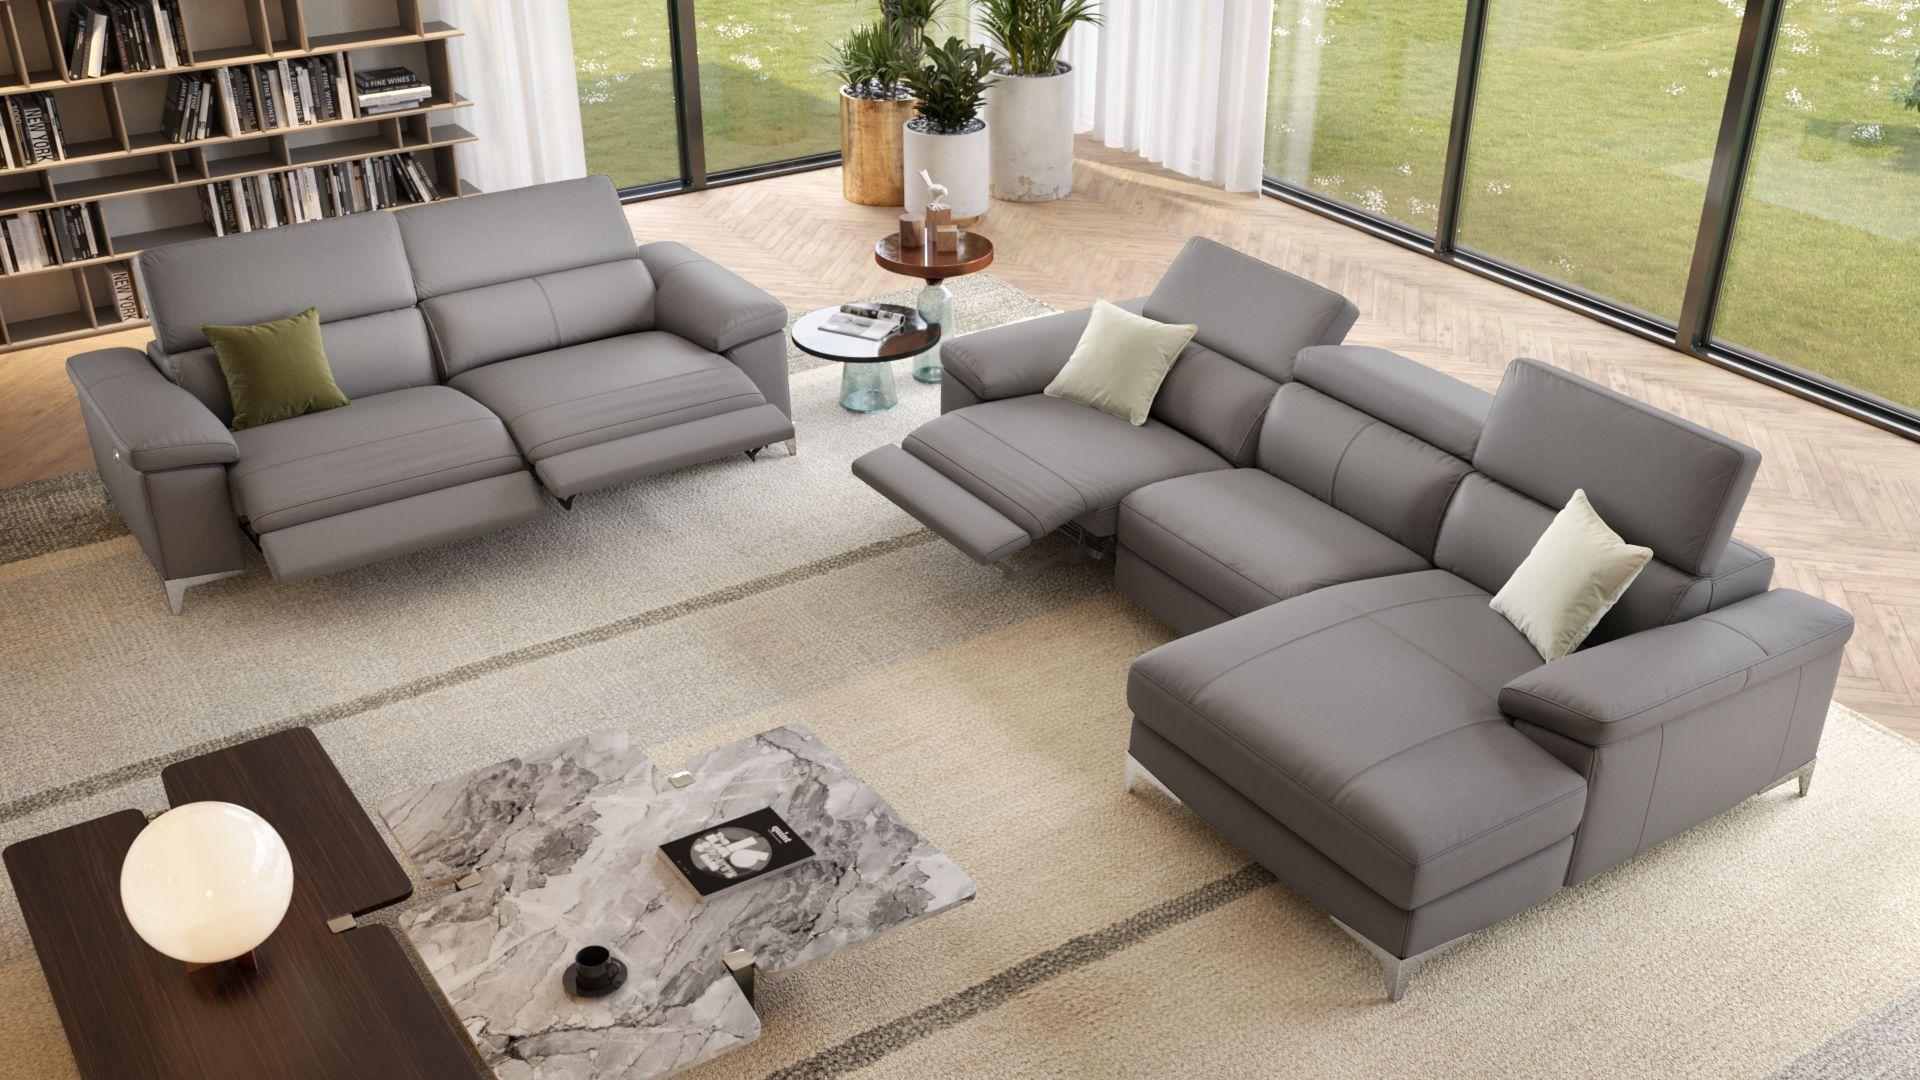 Venosa Leder Relaxsofa Sofa Relaxen Wohnen